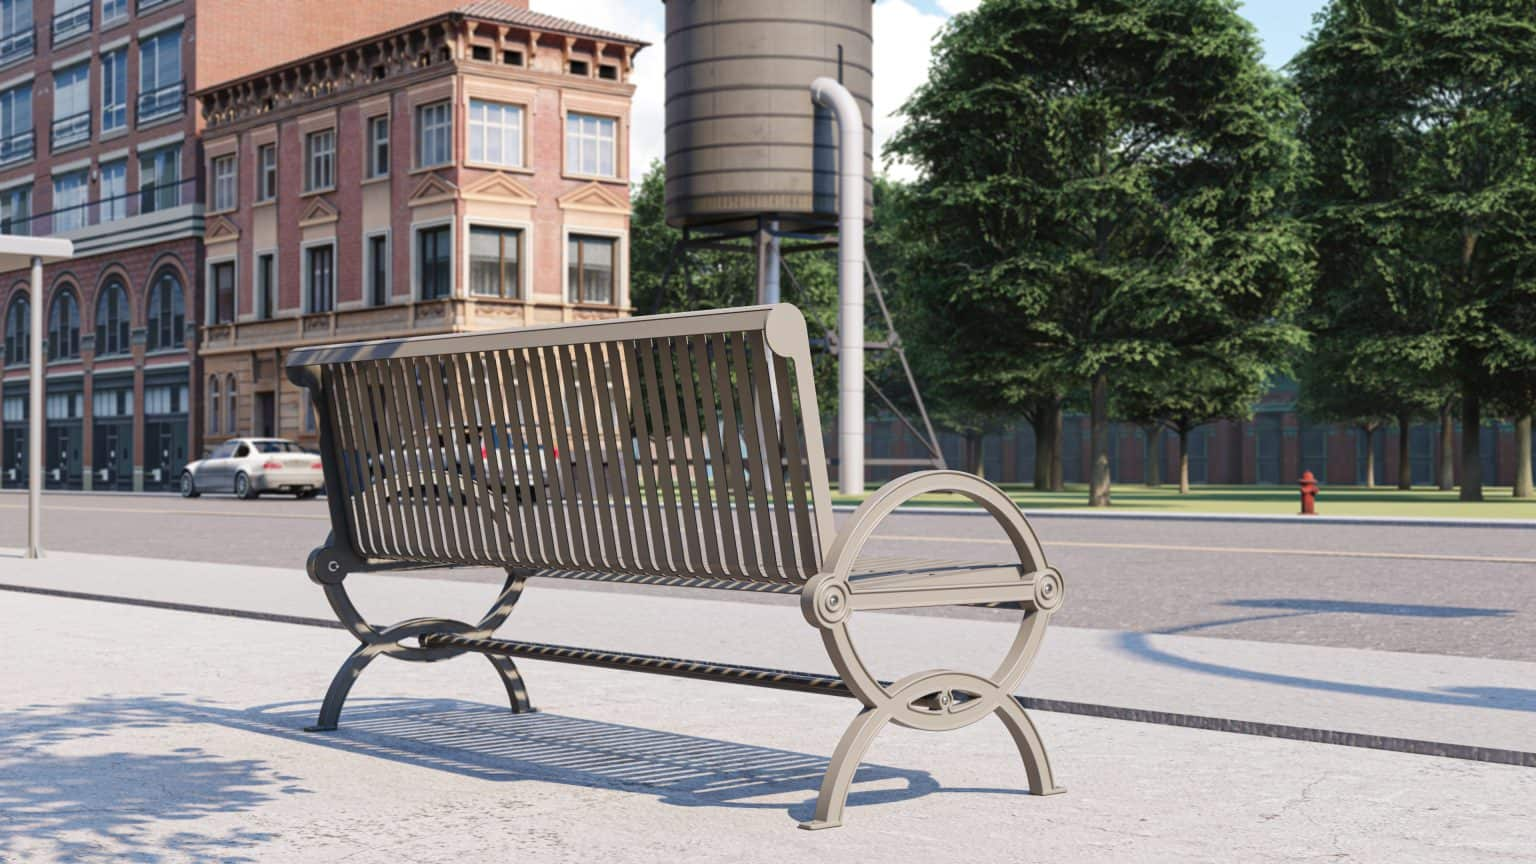 streetscape-furnishings_49644053967_o-1536x864